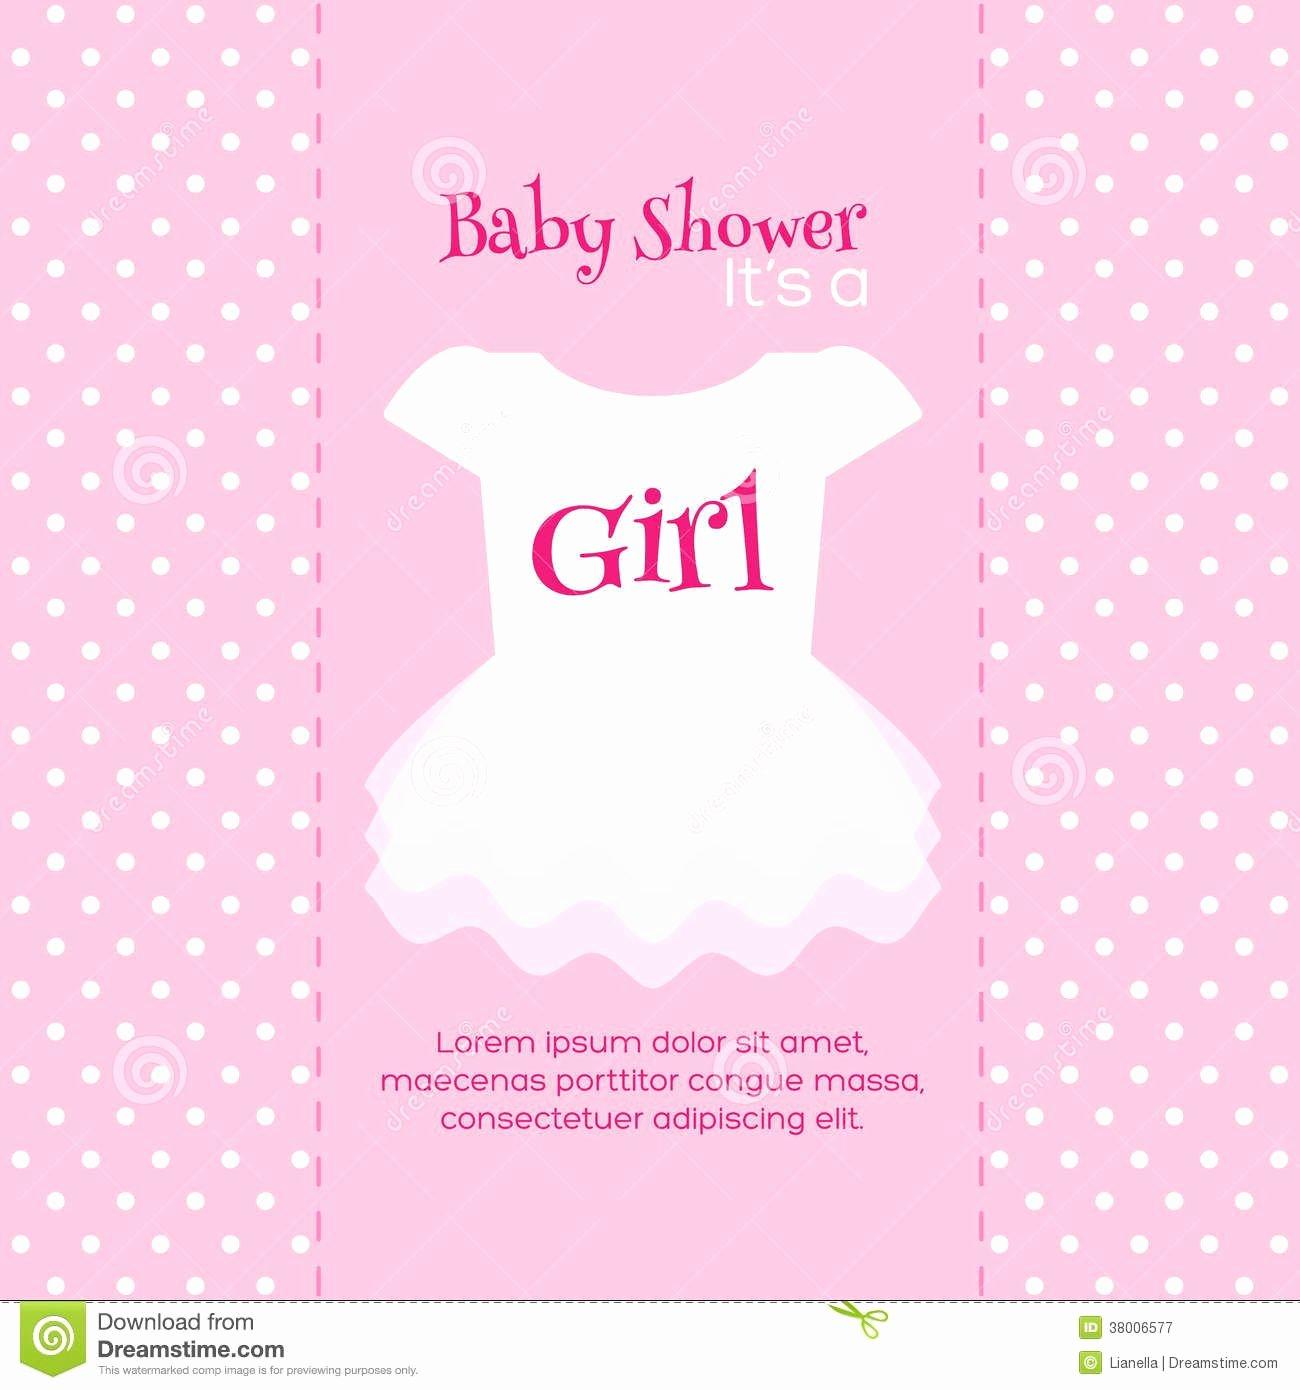 Baby Shower Card Printable Beautiful Design Free Printable Baby Shower Invitations for Girls